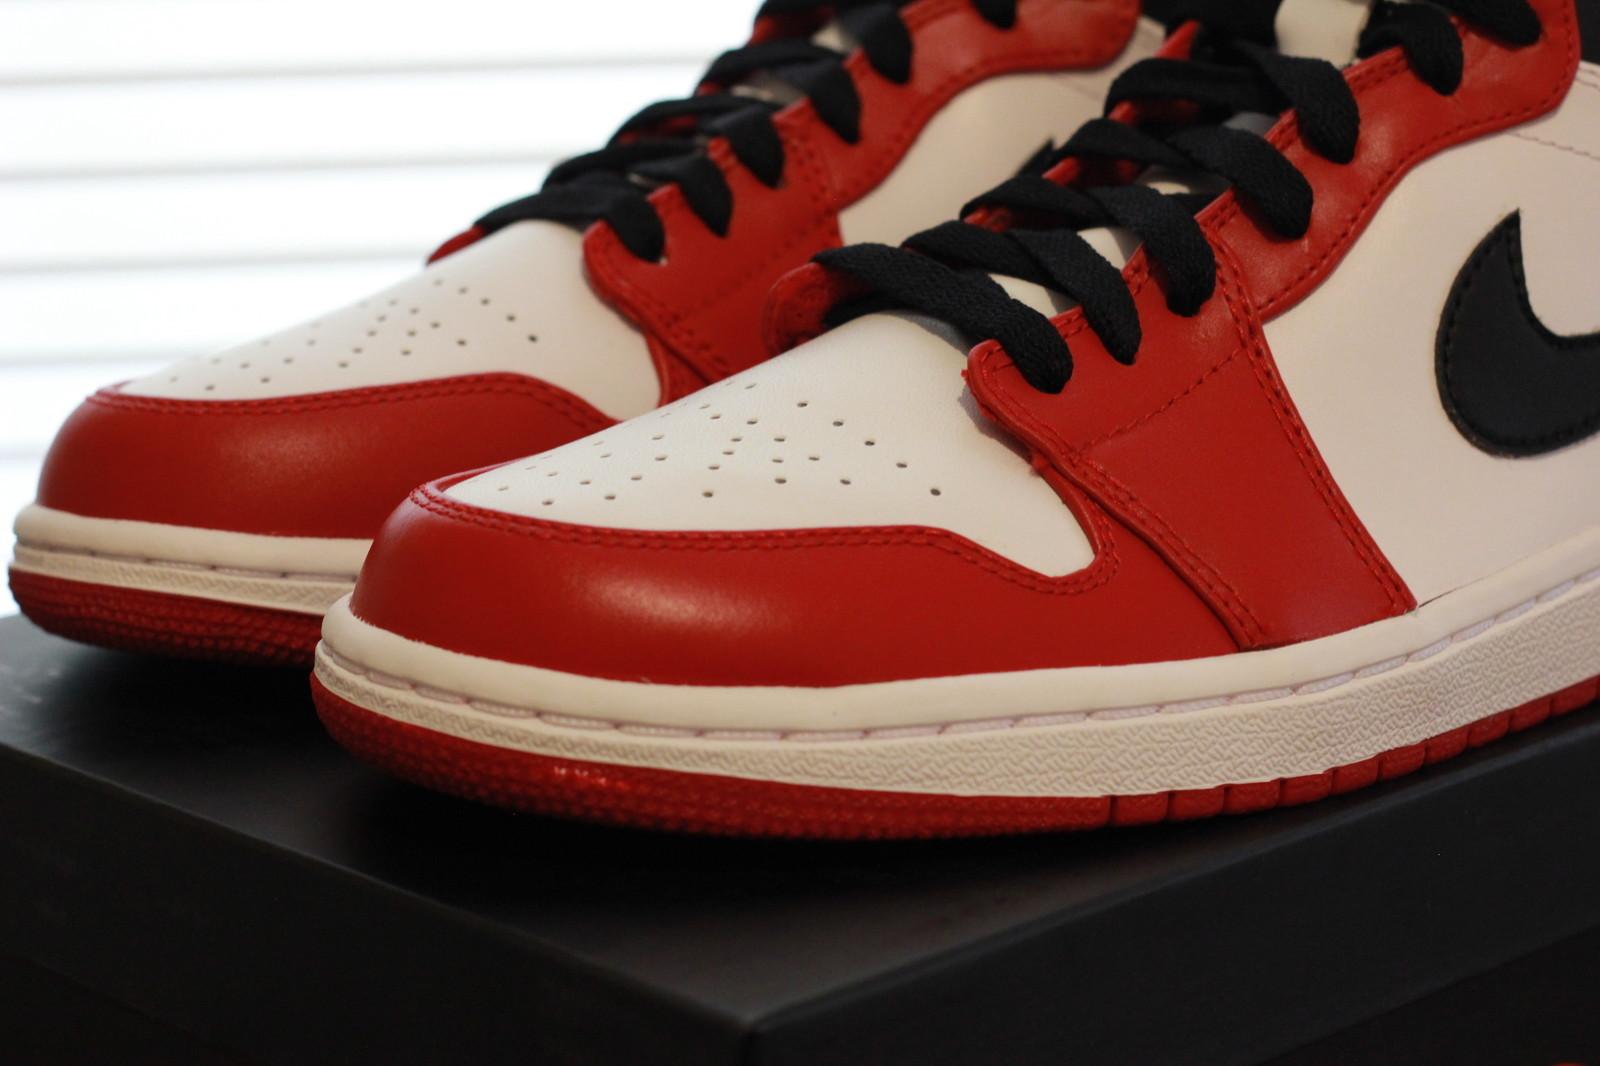 Air-Jordan-1-Retro-High-White-Varsity-Red- 4696fe374